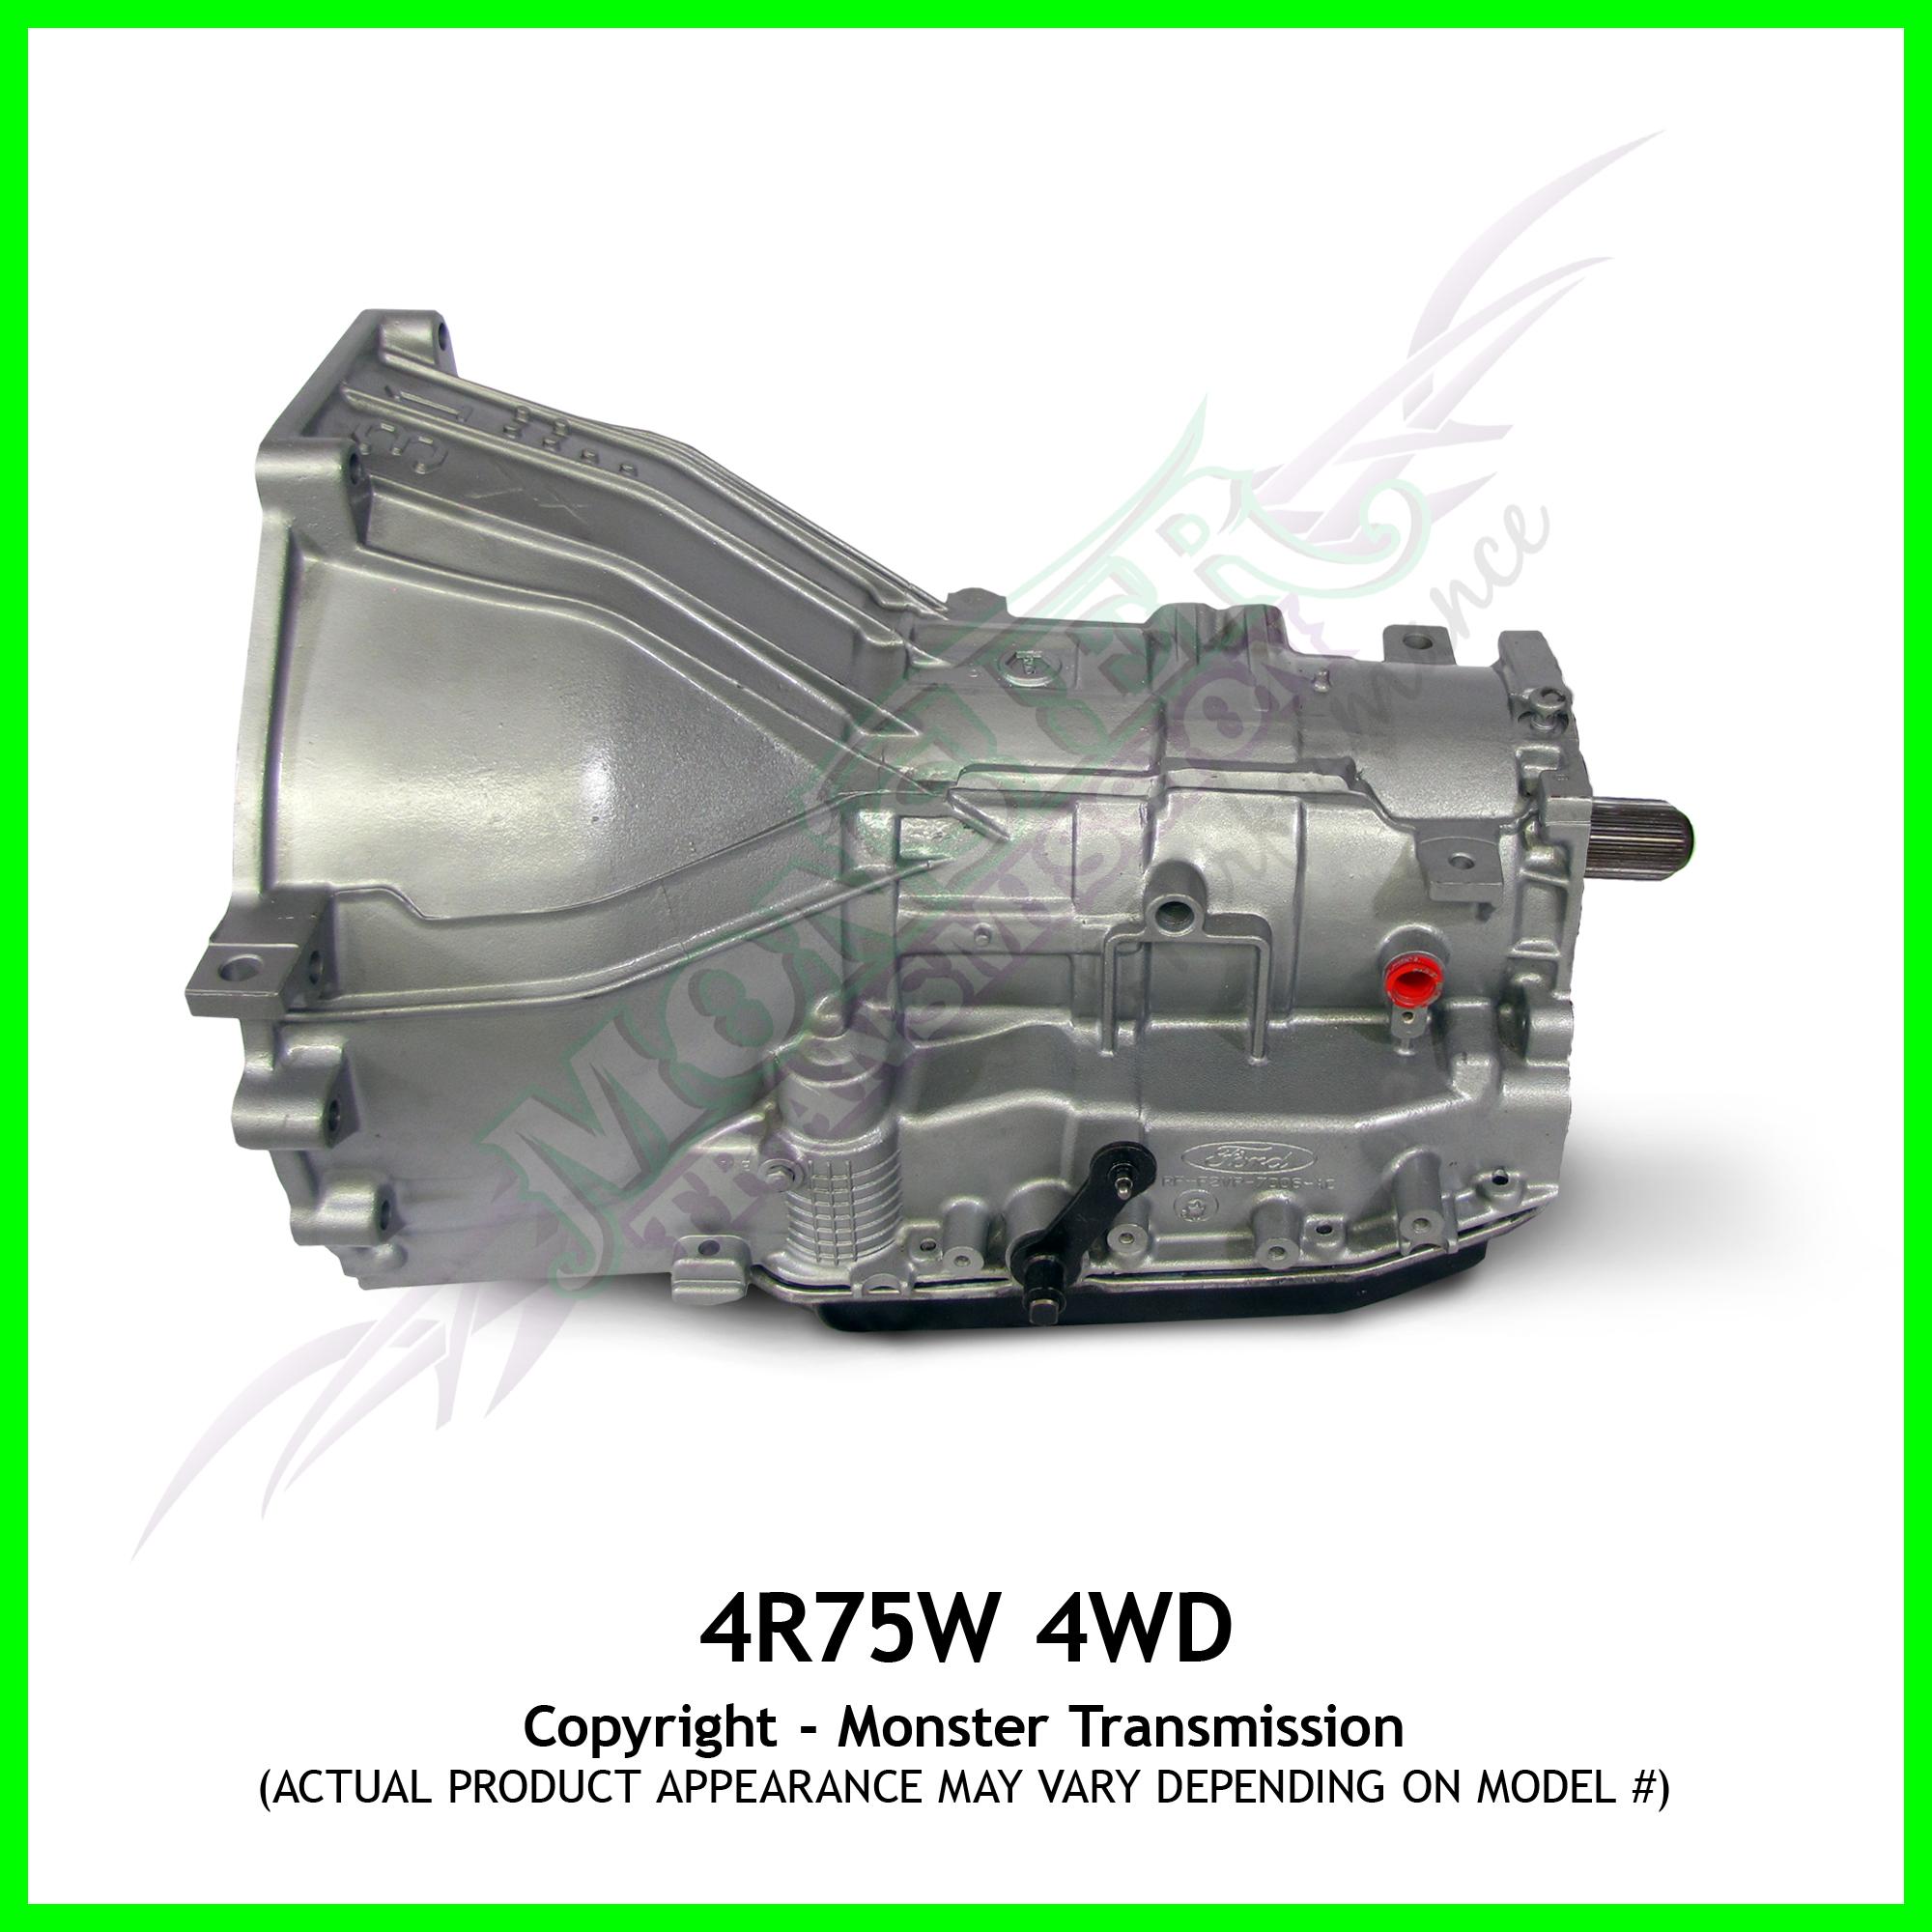 4R75E Transmission For Sale >> 4R75E, 4R75W Transmission, High Performance 4WD, Monster ...